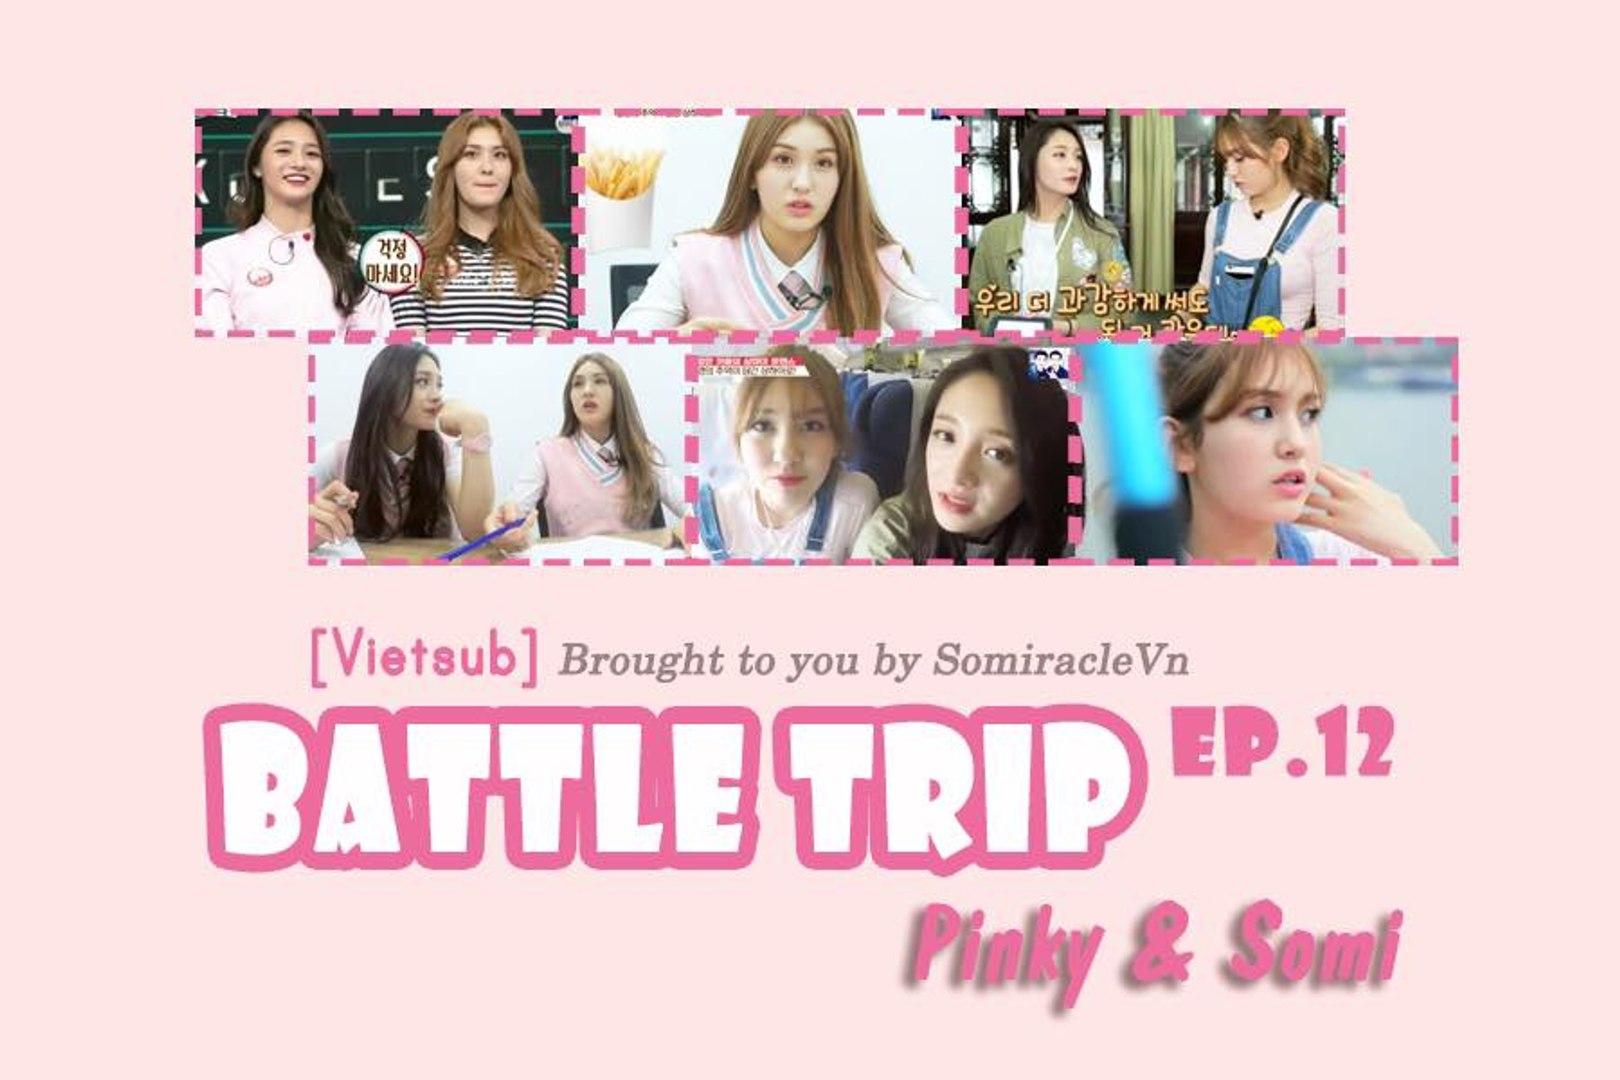 [Vietsub] Battle Trip - Ep.12 Part 3/4 Pinky & Somi